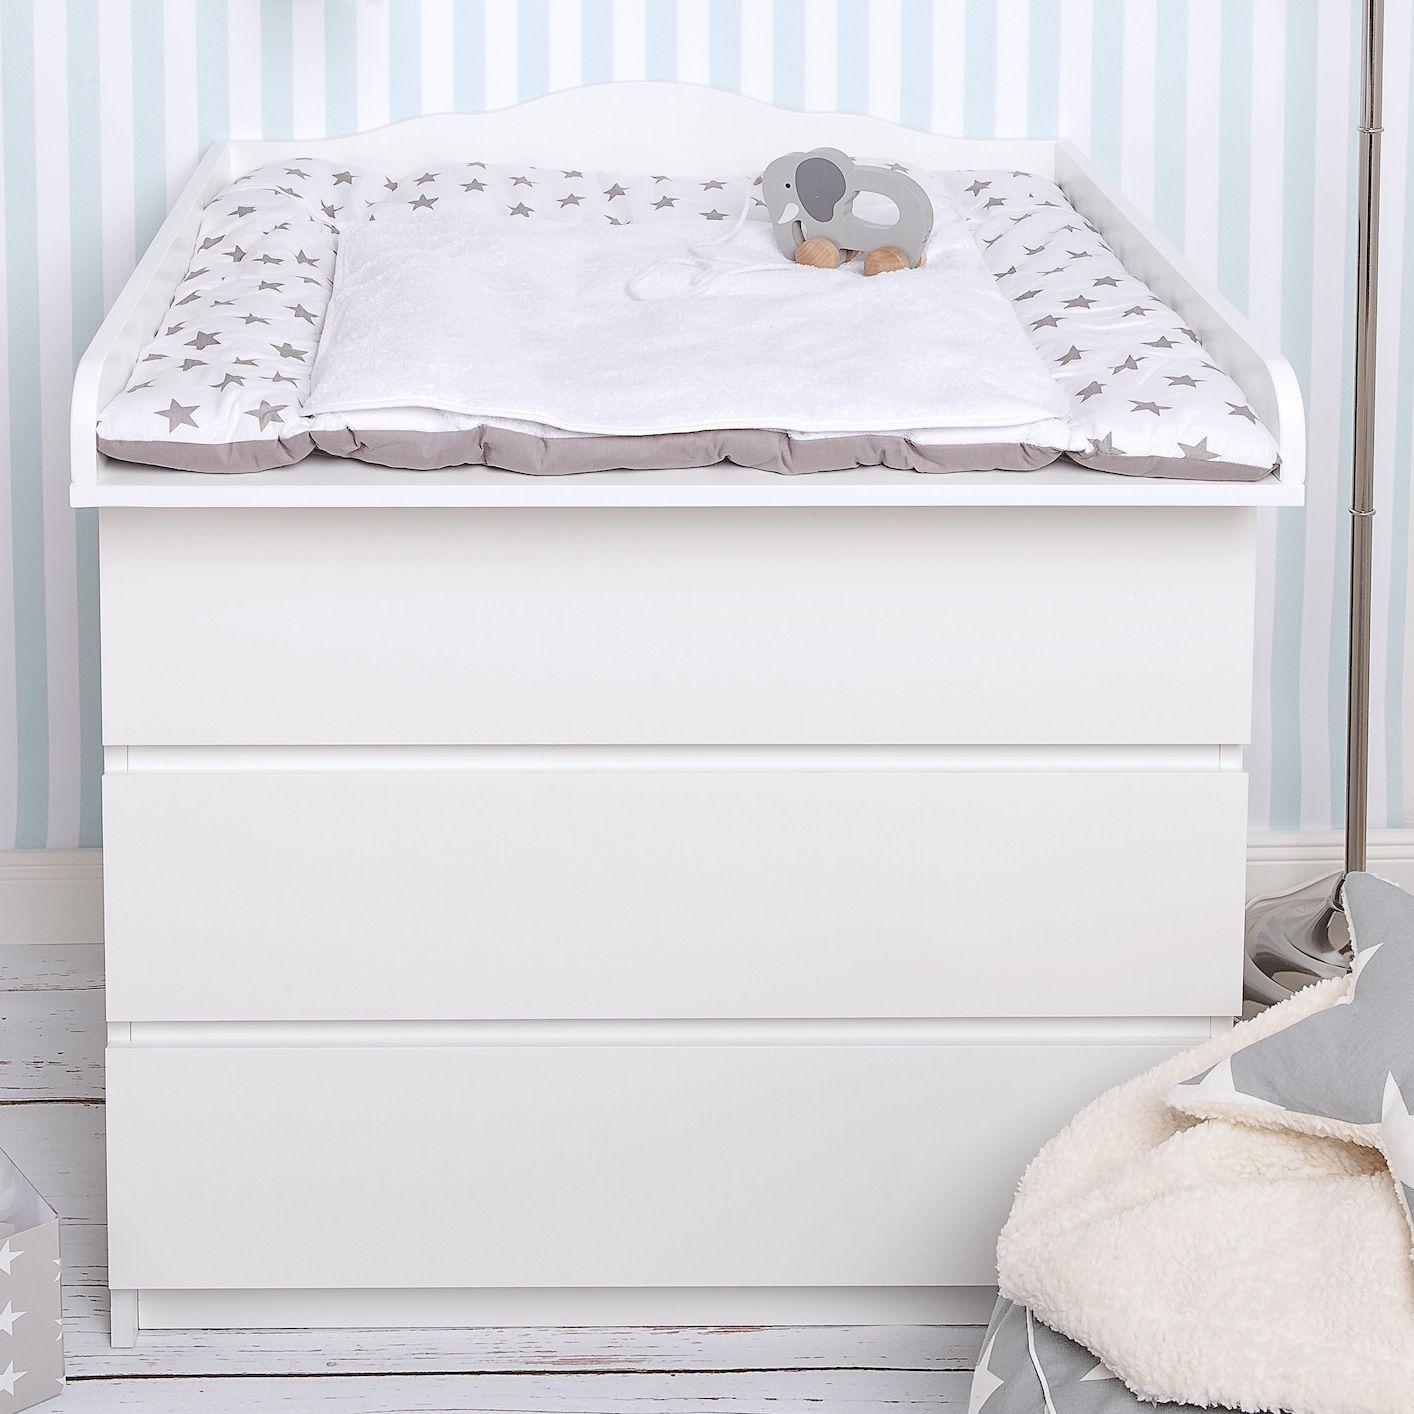 ikea dormitorios bebe - Buscar con Google